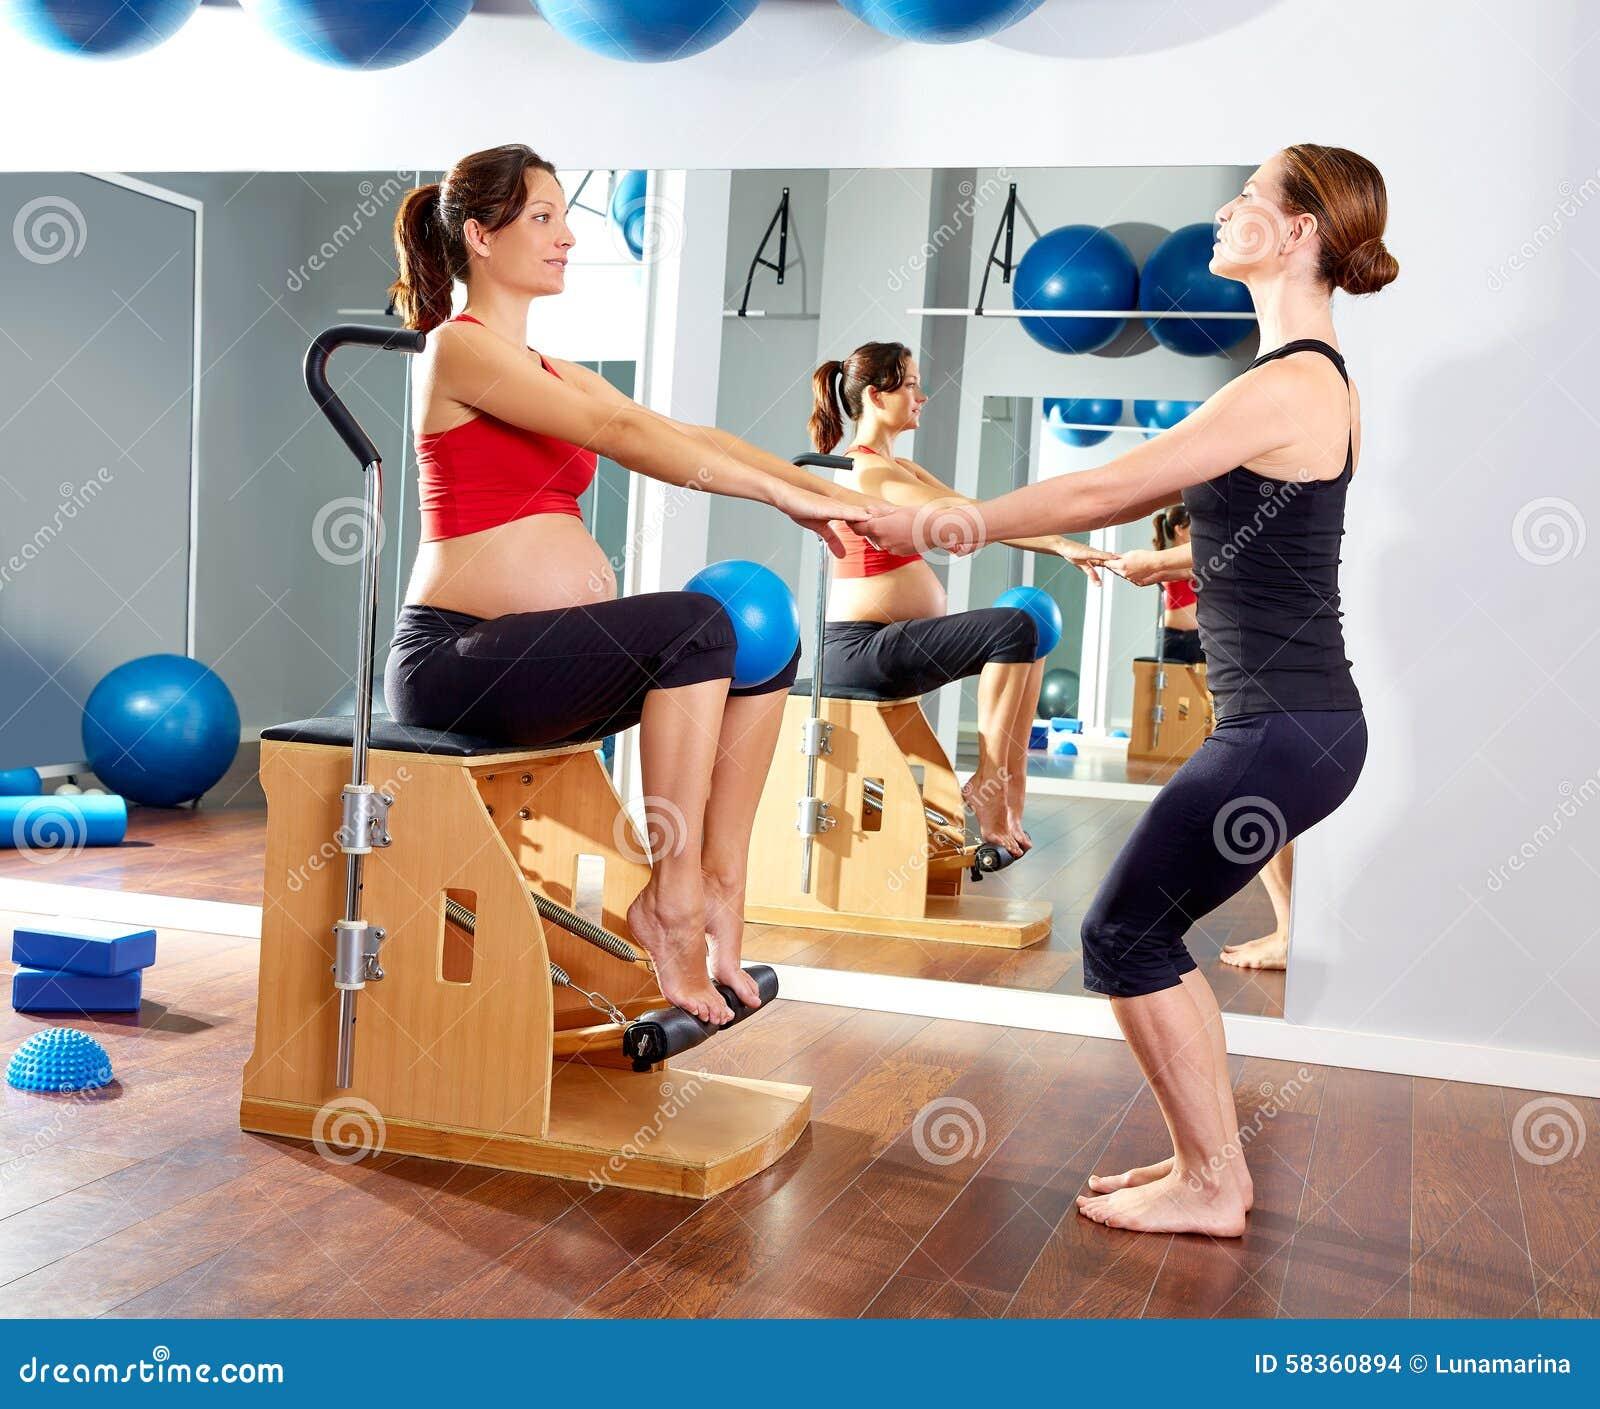 Woman Pilates Chair Exercises Fitness Stock Photo: Pregnant Woman Pilates Leg Pumps Exercise Wunda Stock